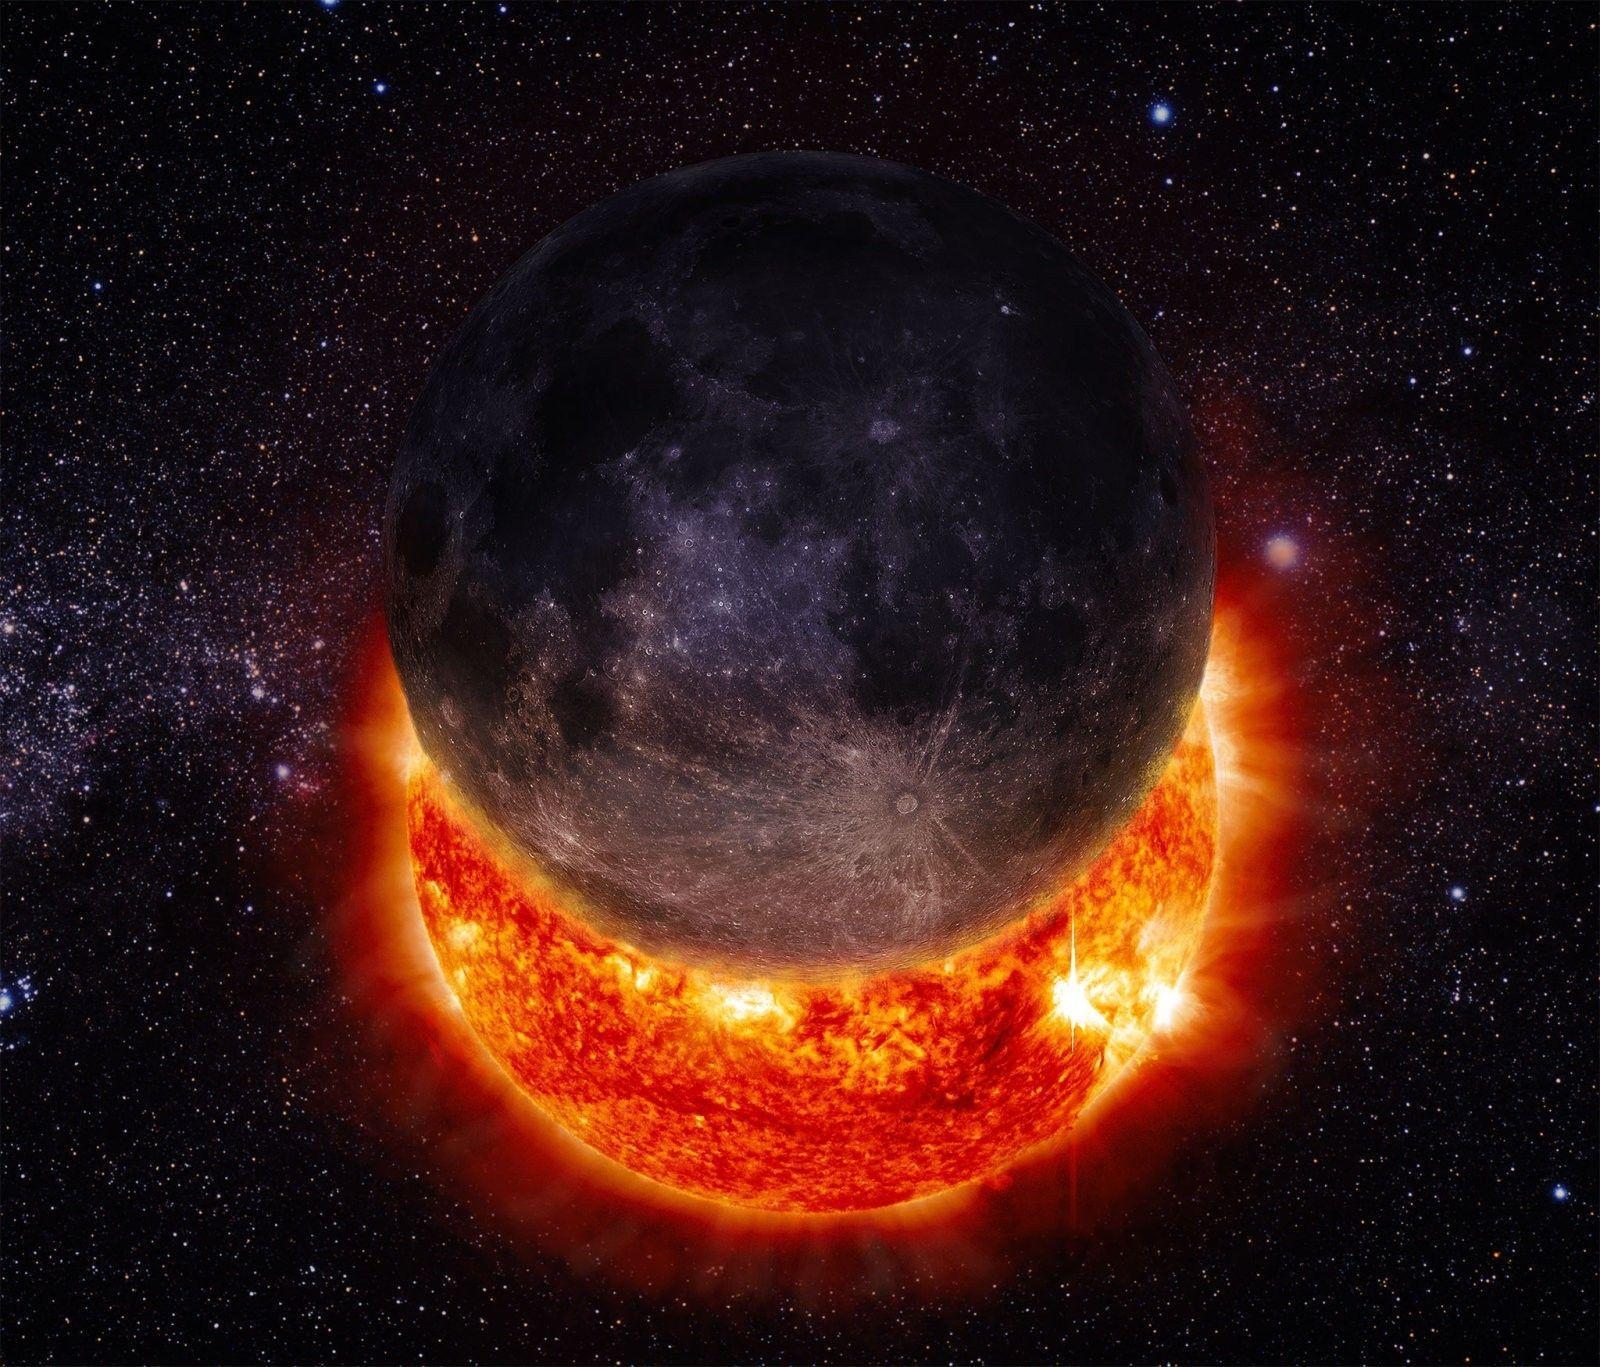 Galaxy Solar Eclipse Wallpapers Top Free Galaxy Solar Eclipse